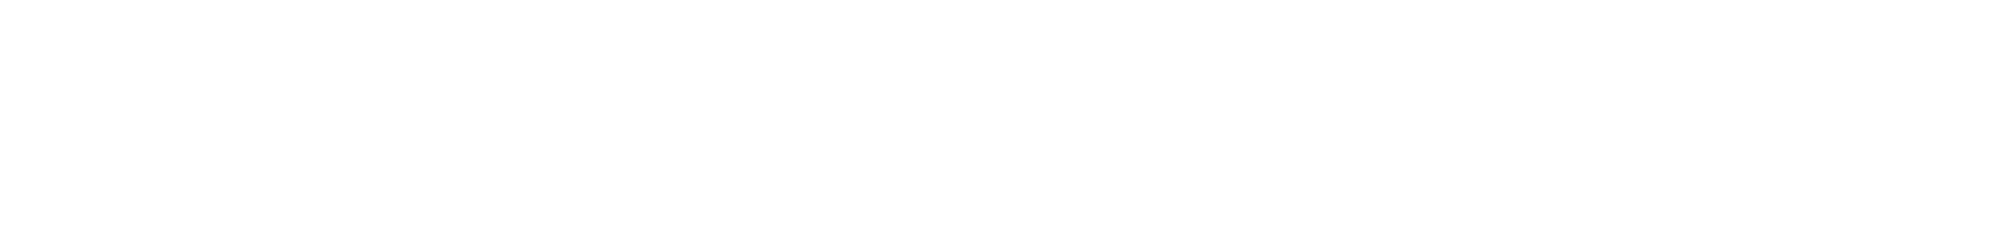 Buzz Feed News